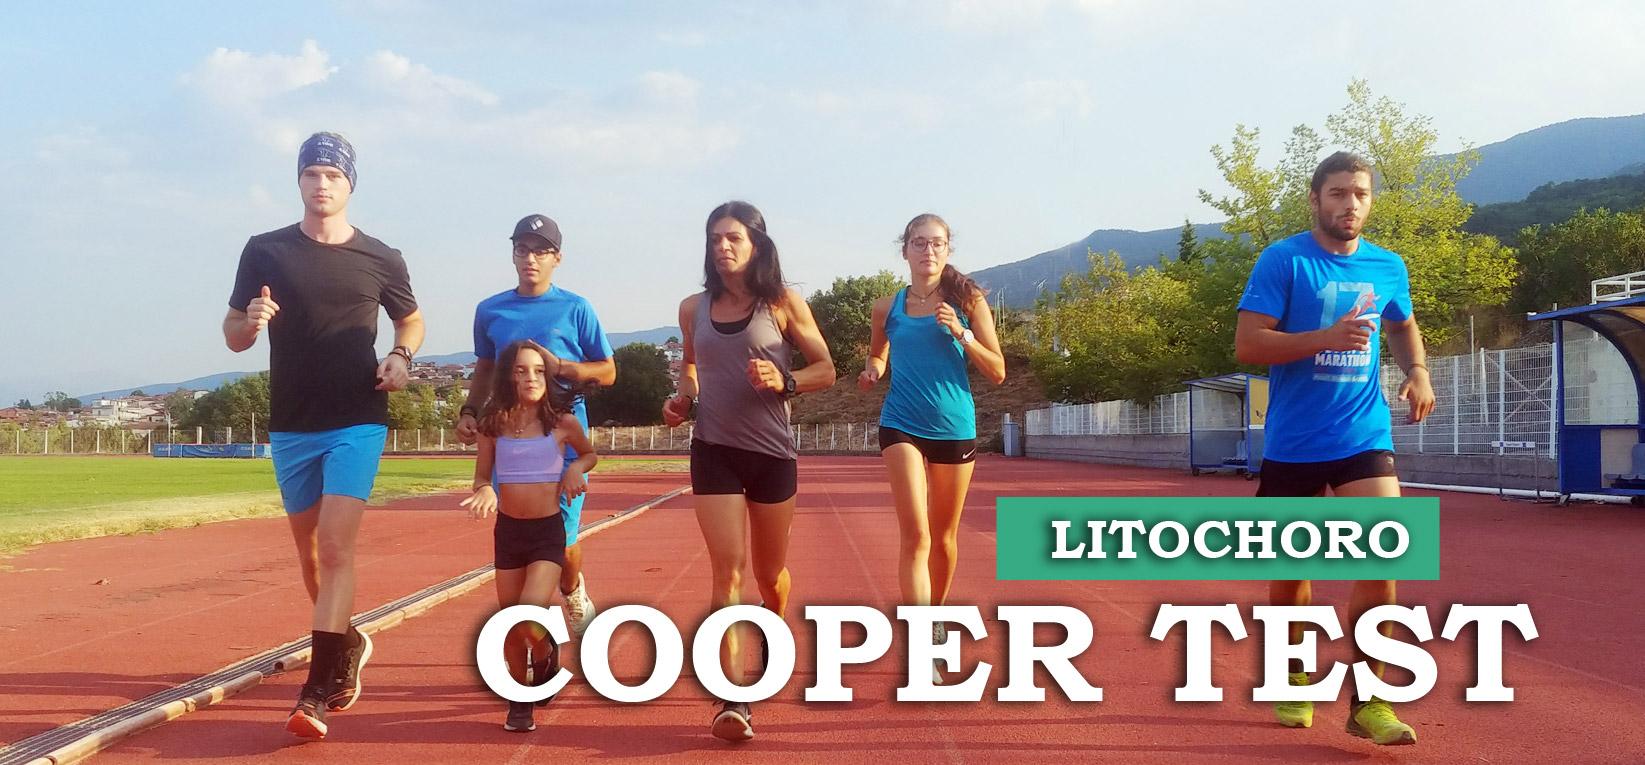 Litochoro Cooper Test